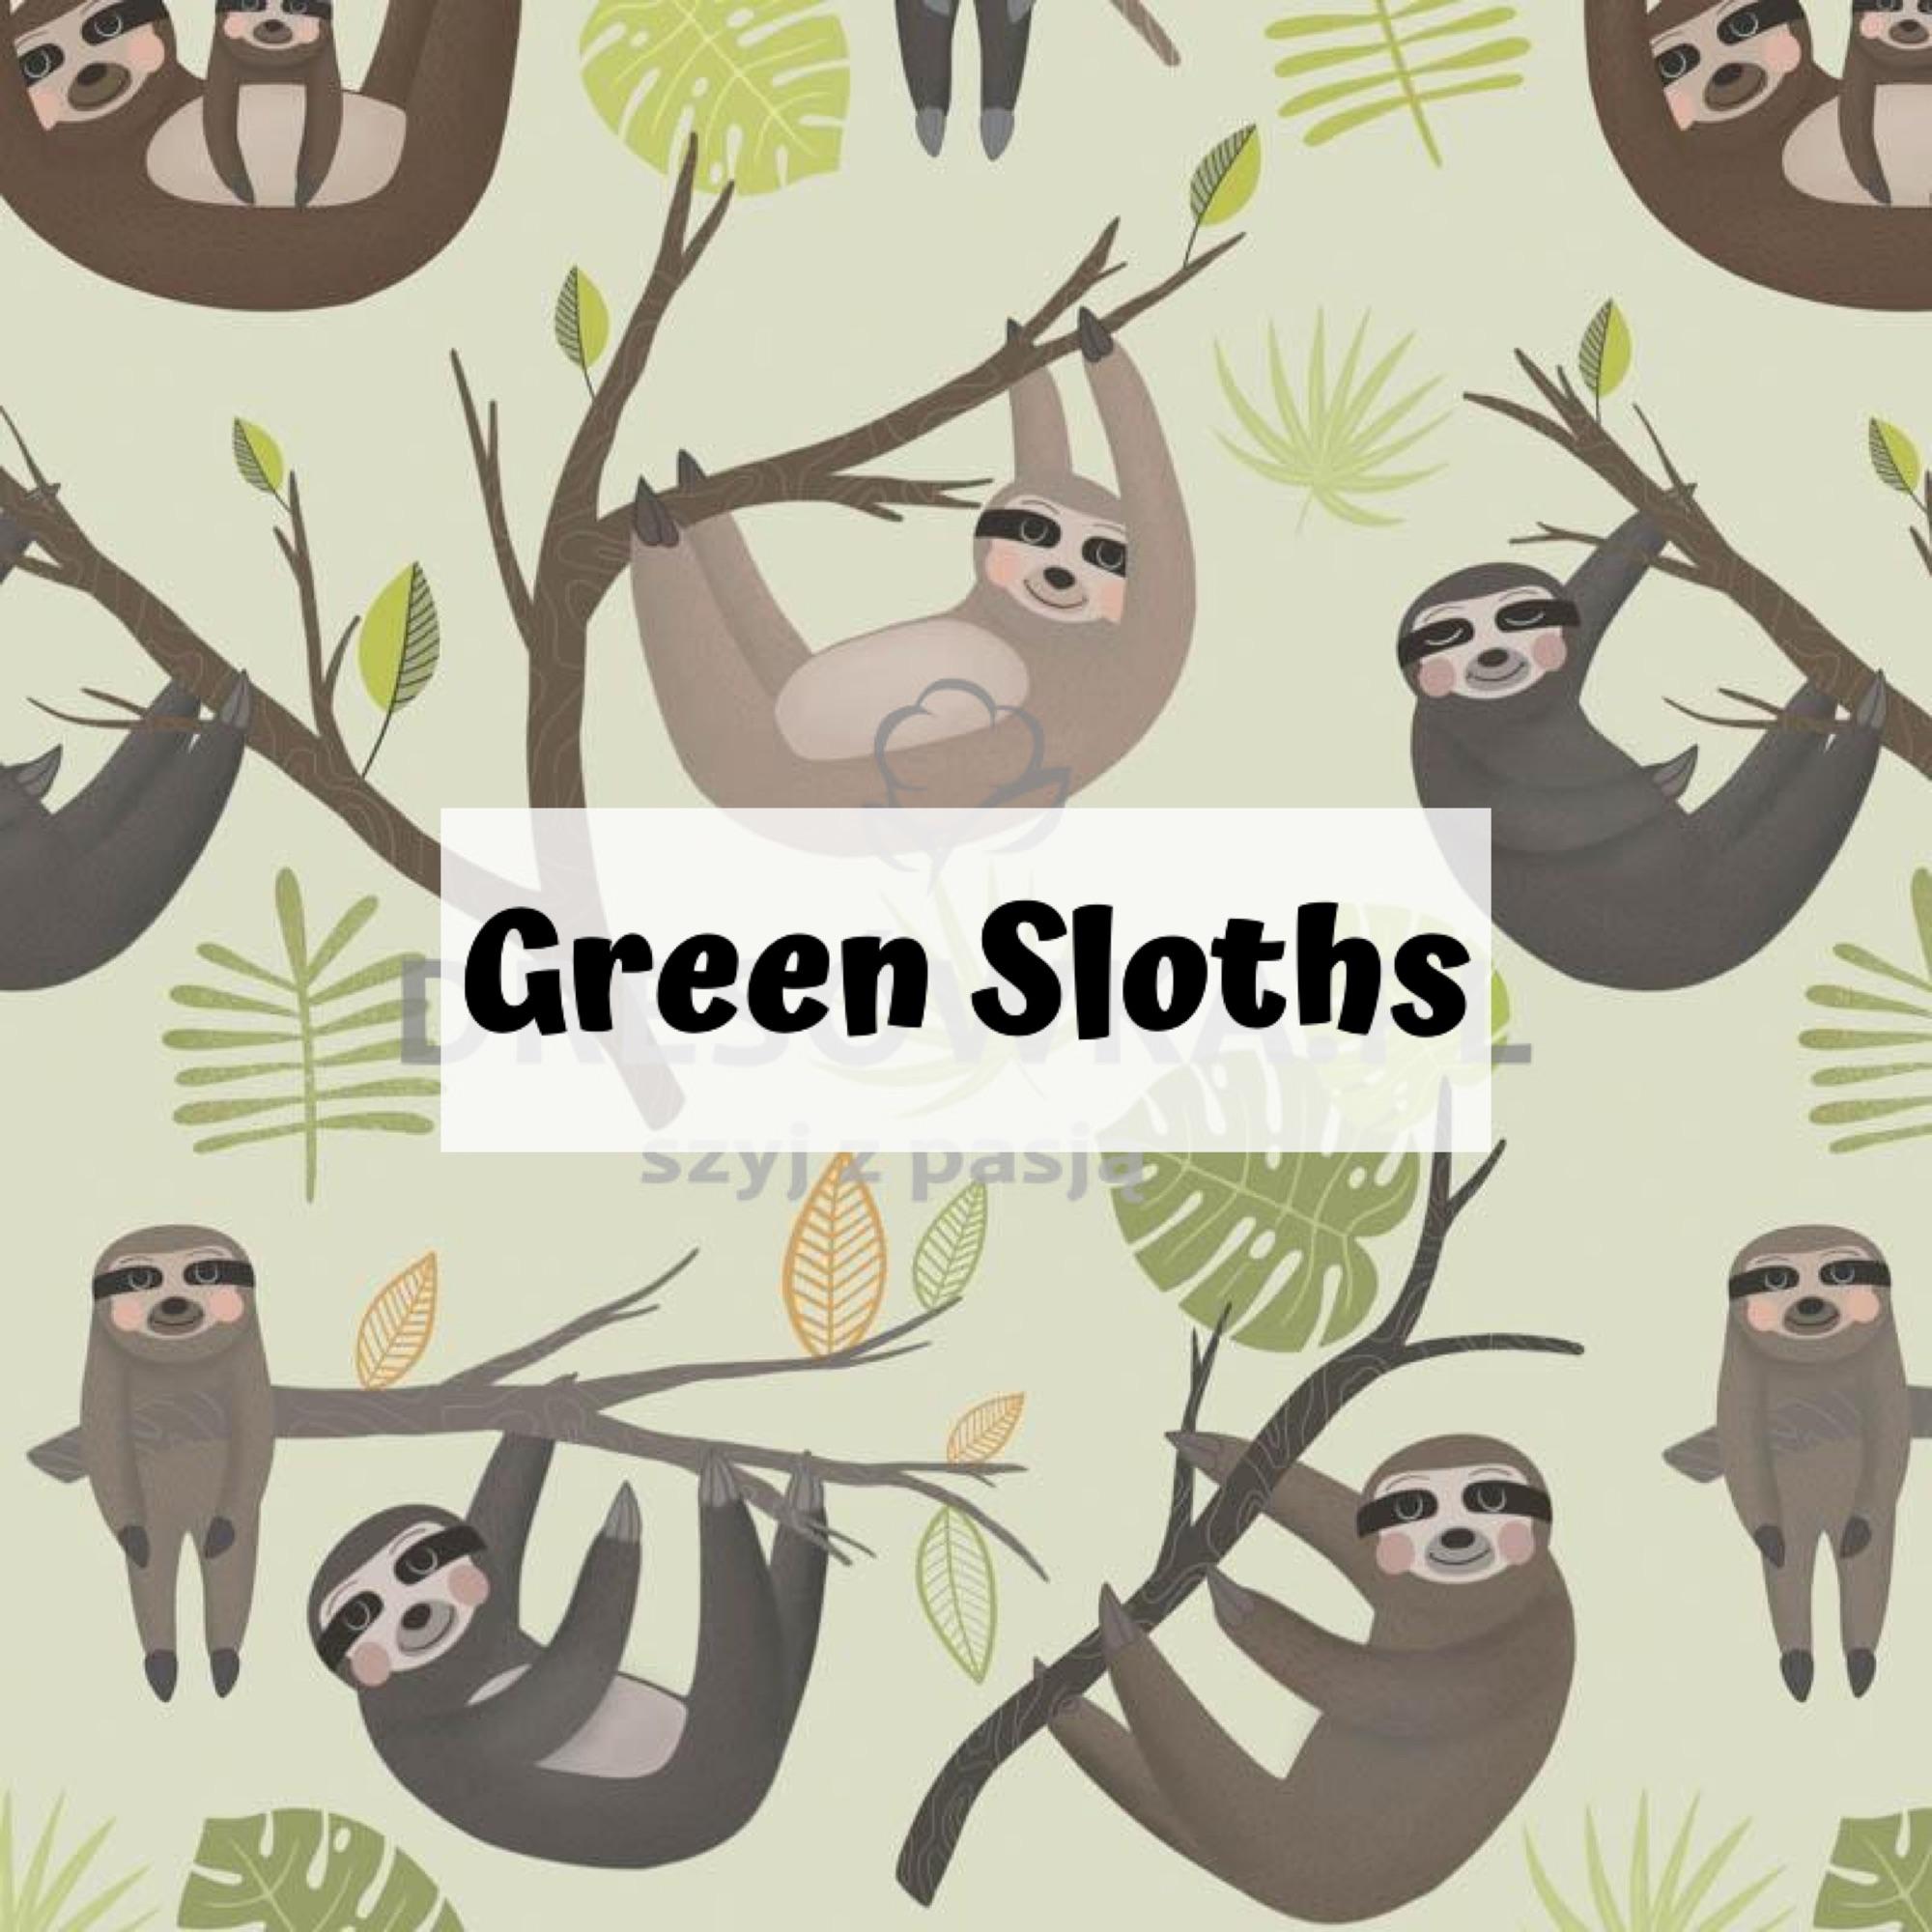 Green Sloths